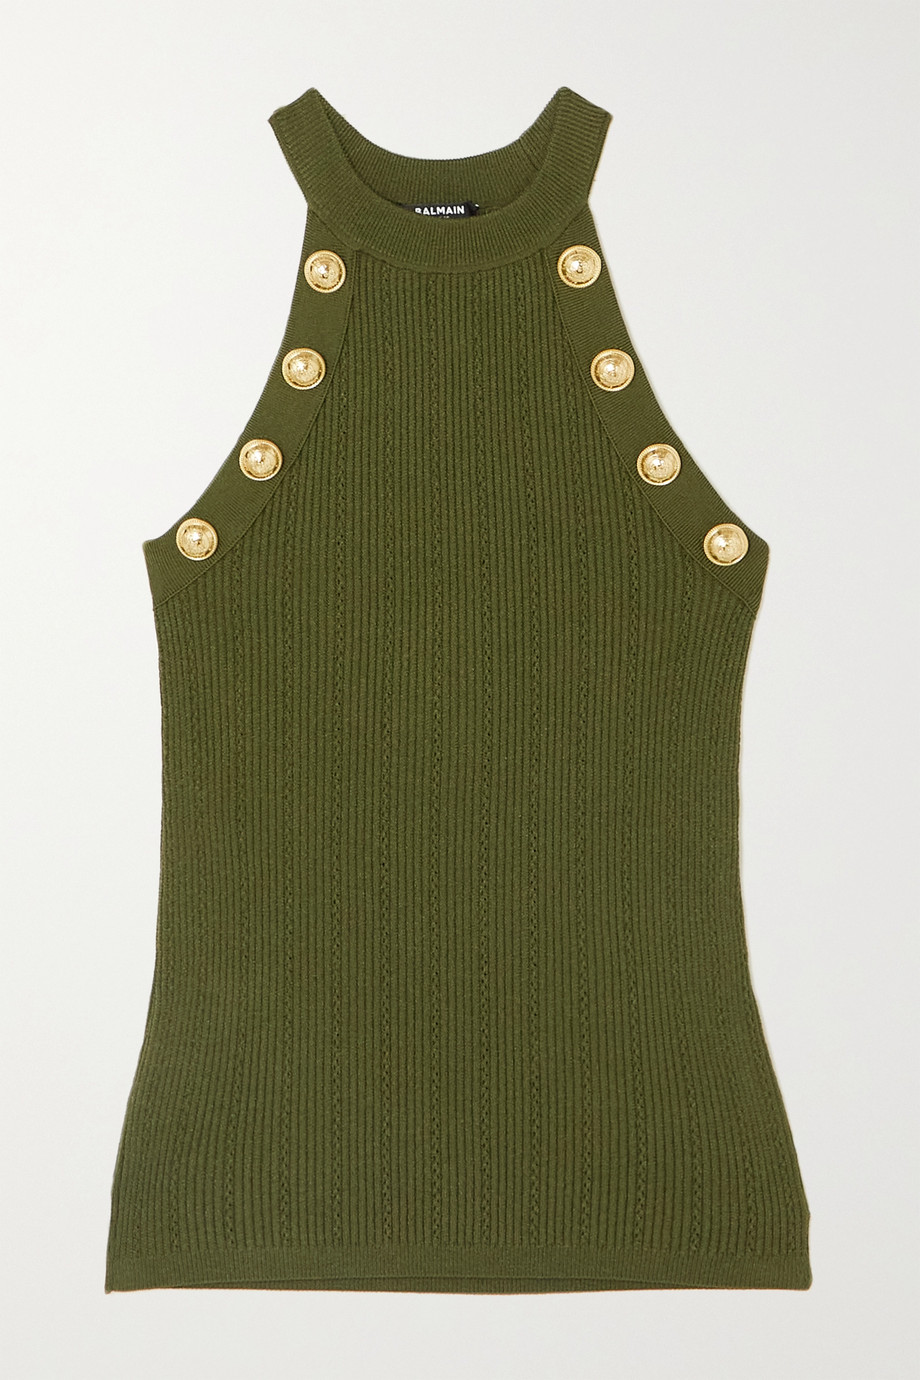 Balmain Button-embellished ribbed-knit tank